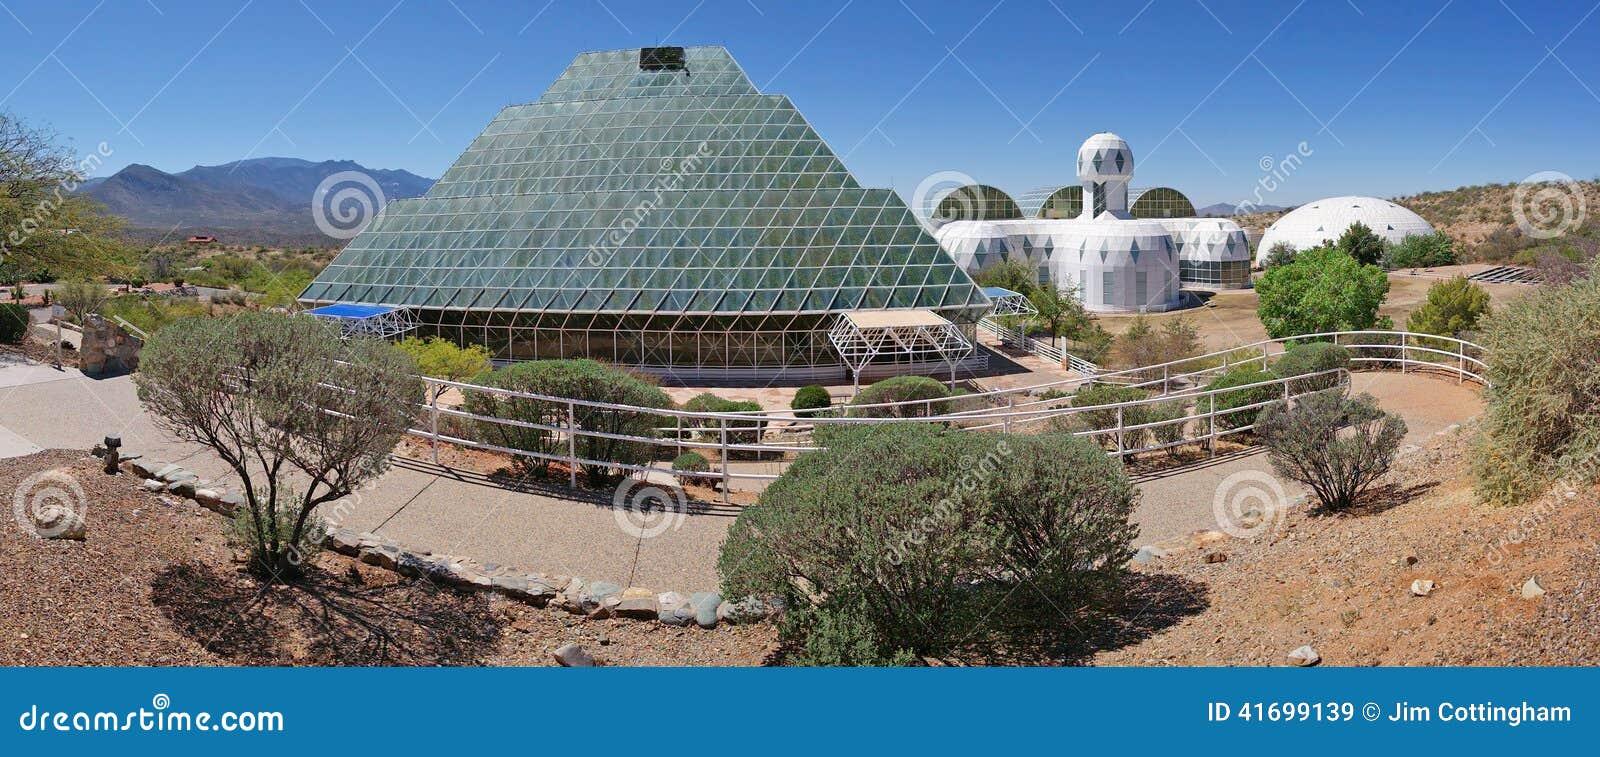 BioSphere 2 - Panorama